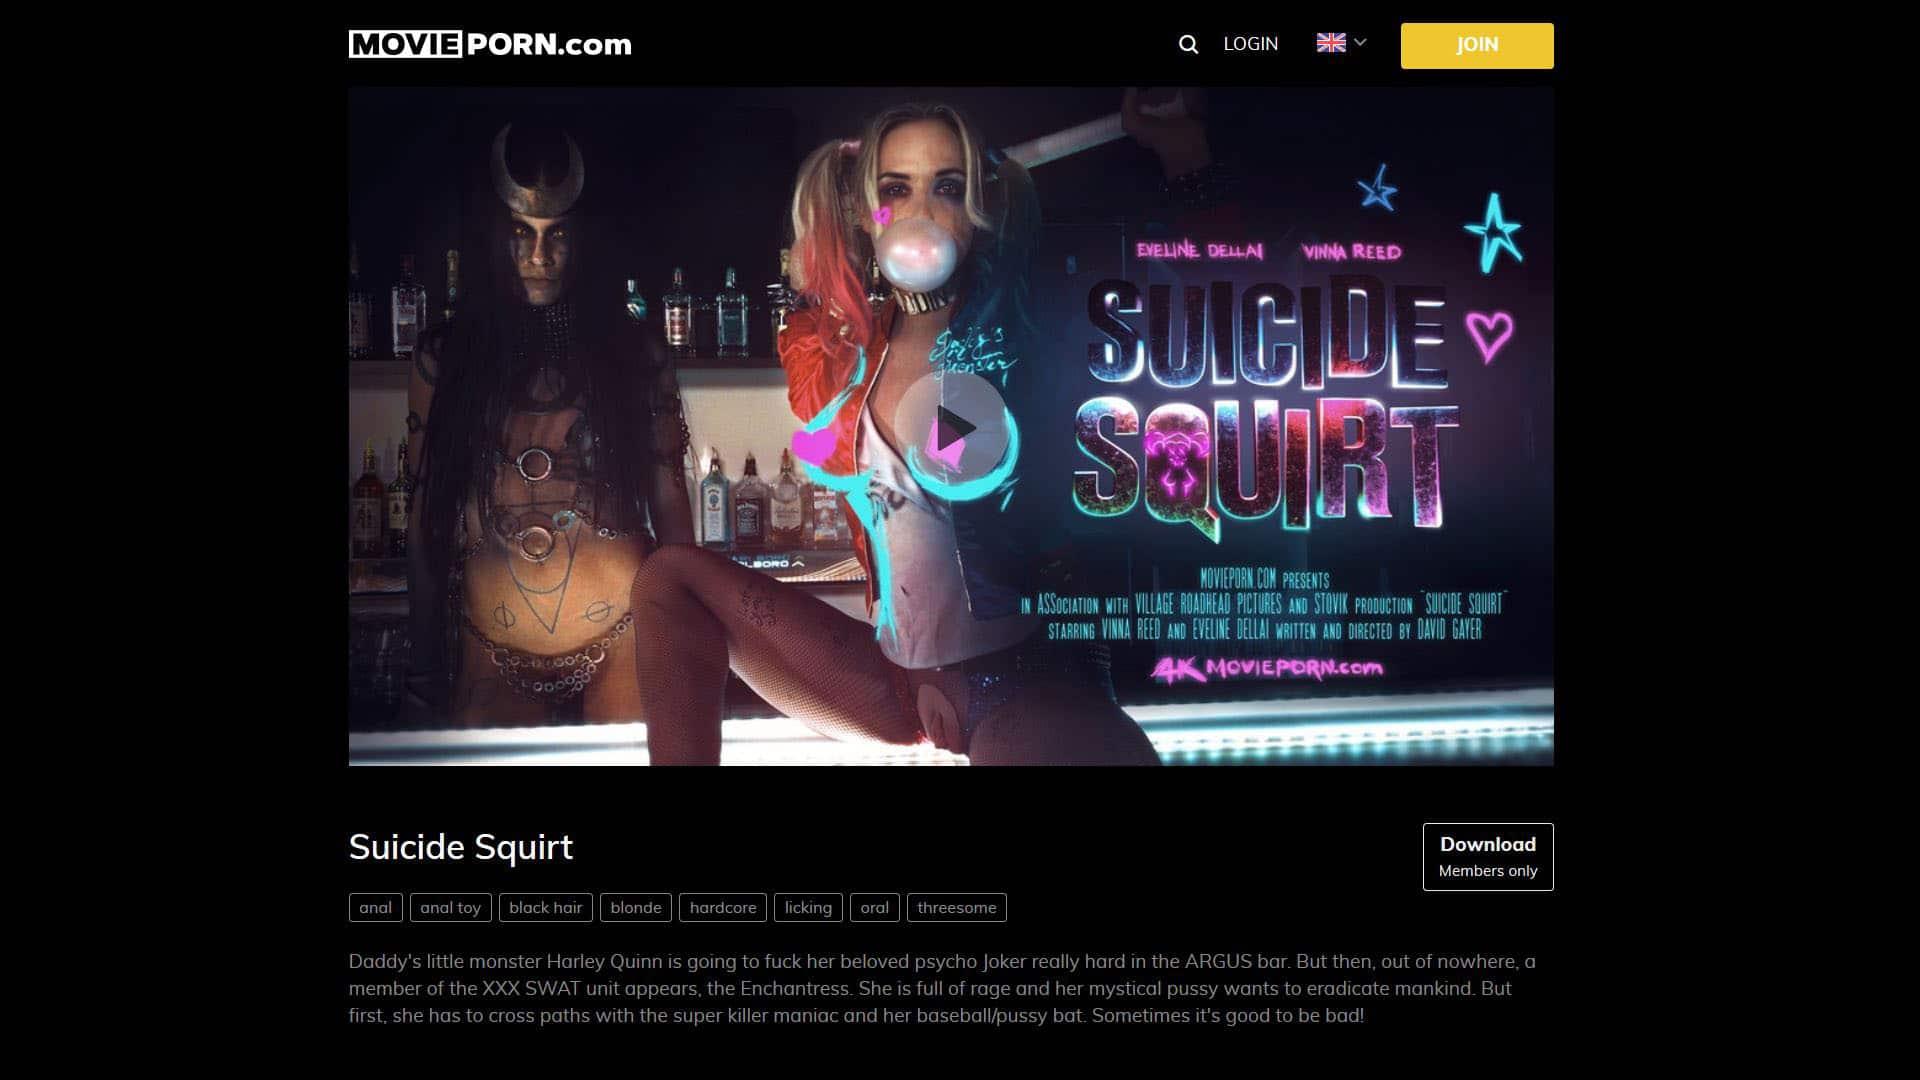 MoviePorn Suicide Squirt